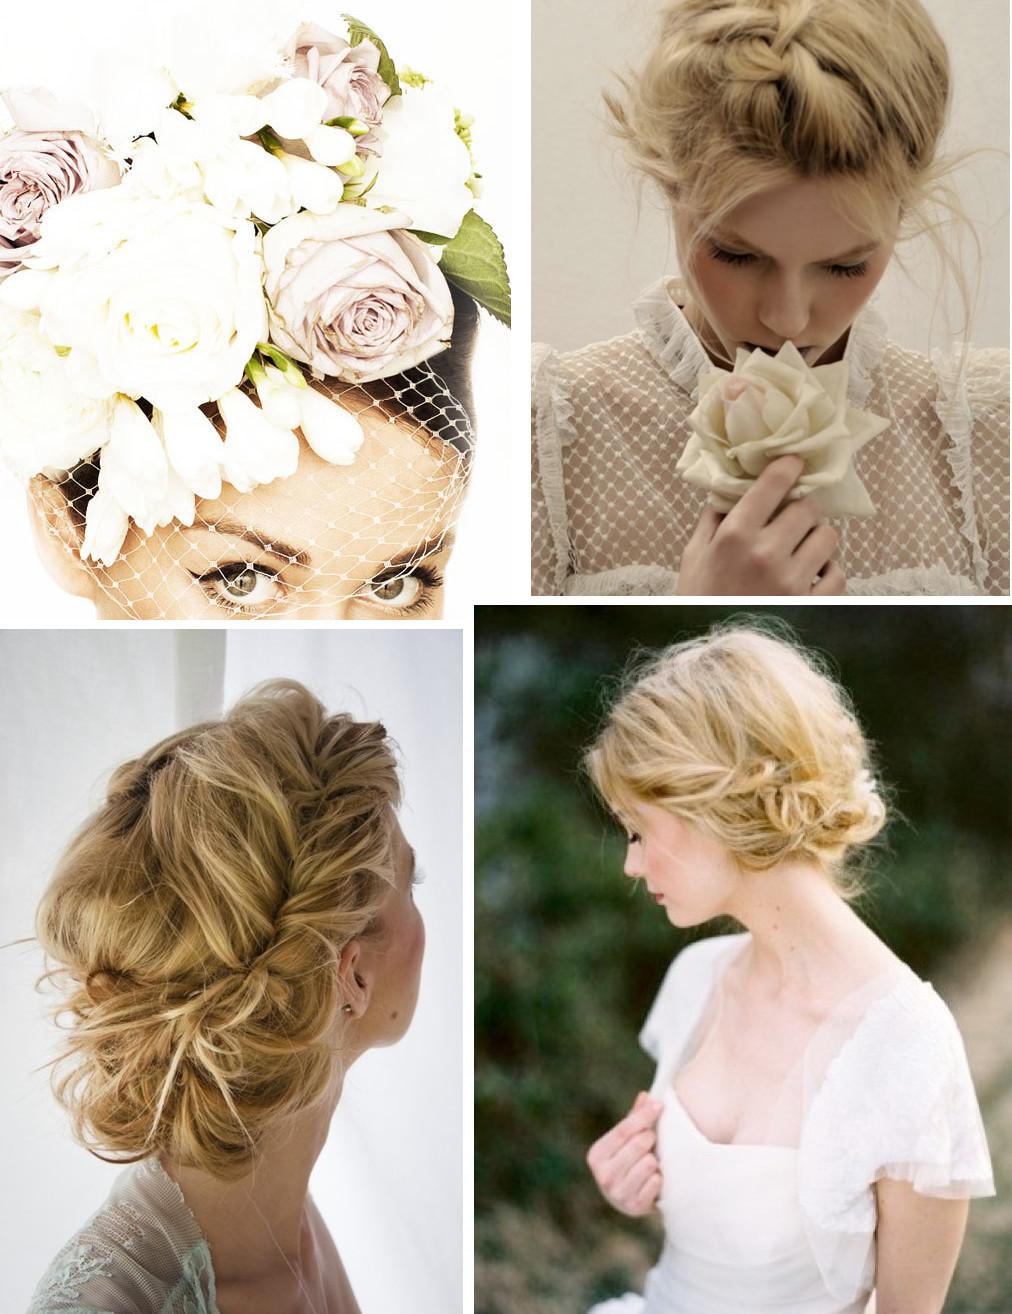 Best ideas about DIY Wedding Updos . Save or Pin DIY wedding hair tutorials bridal beauty celebrity Now.